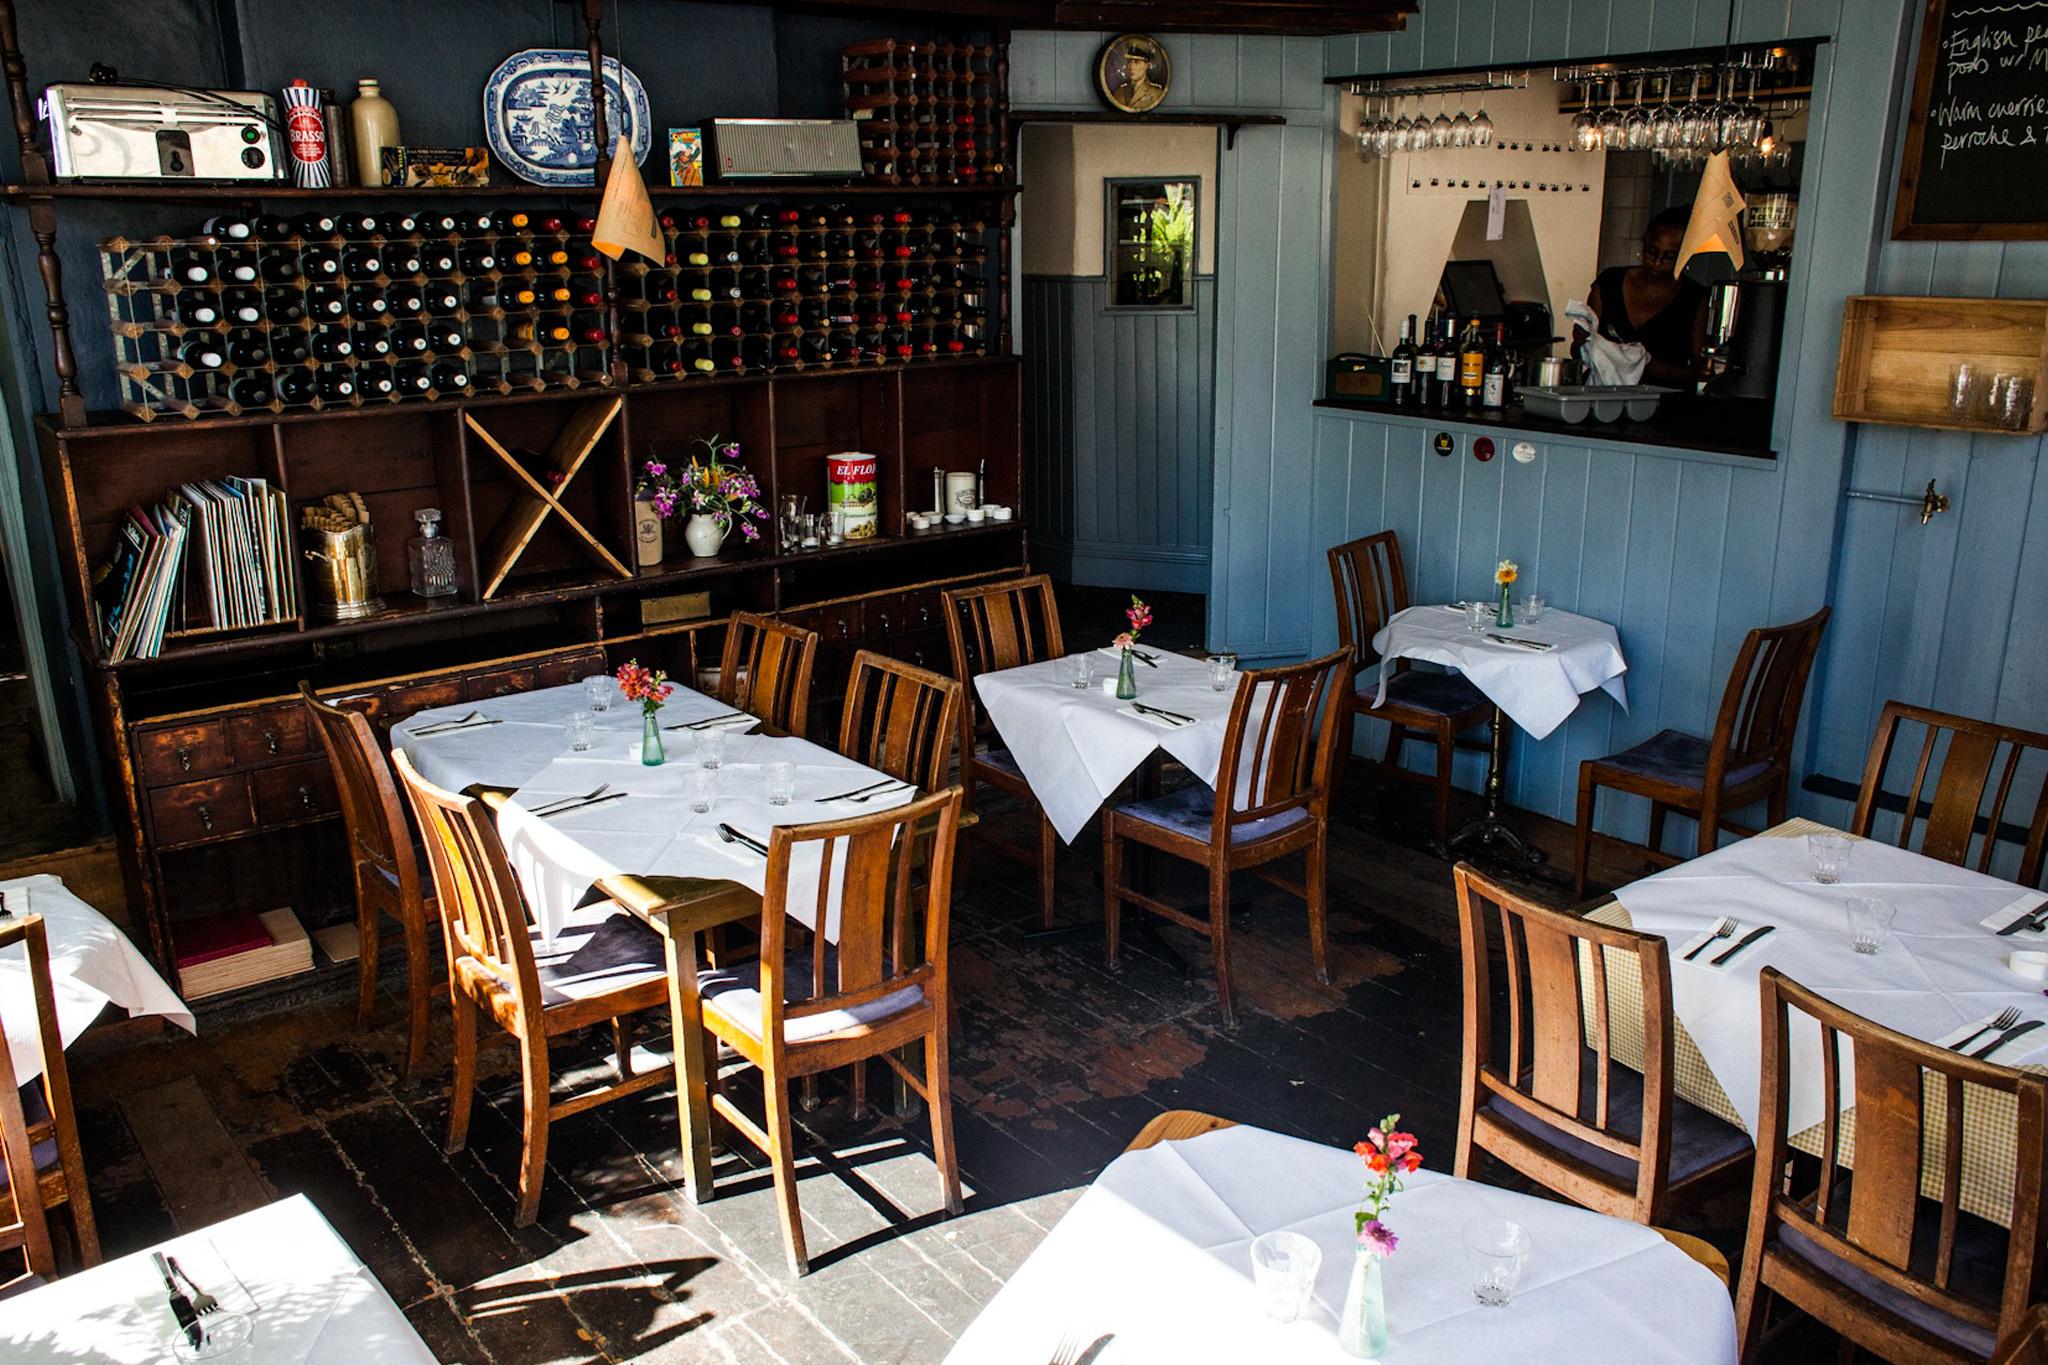 Bell's Diner & Bar Rooms